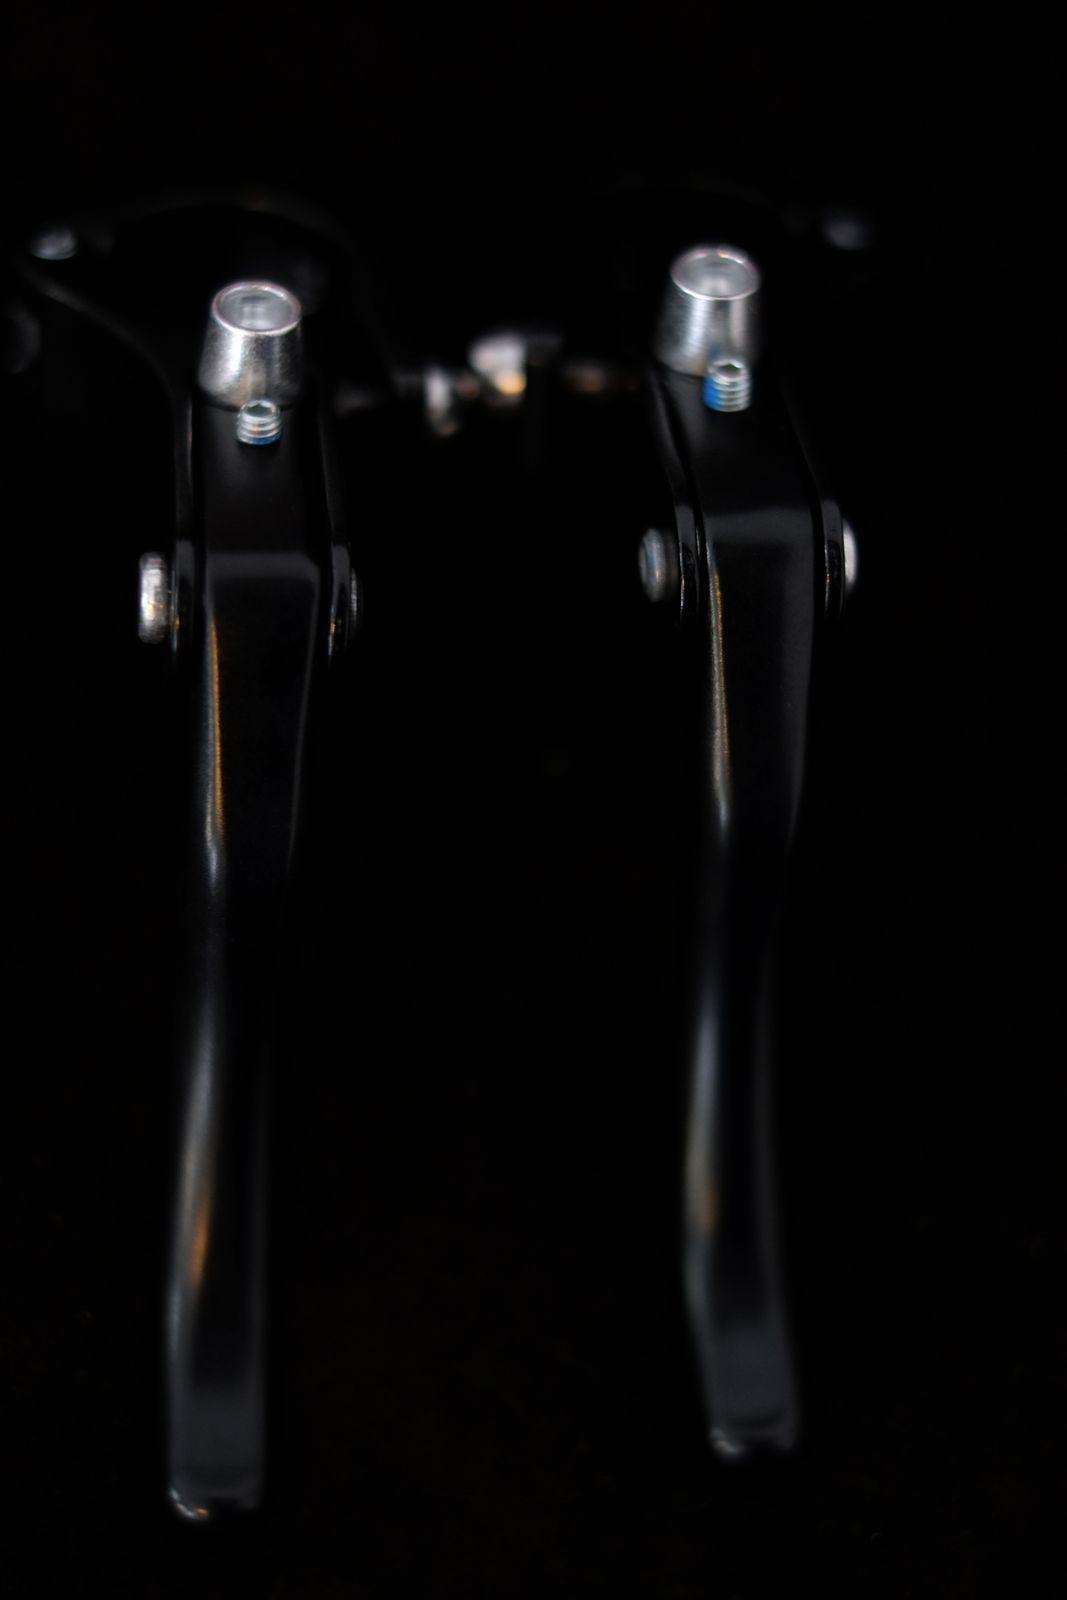 Promax Bremshebel Set Pro Max Retro Lever Singlespeed in silber oder schwarz